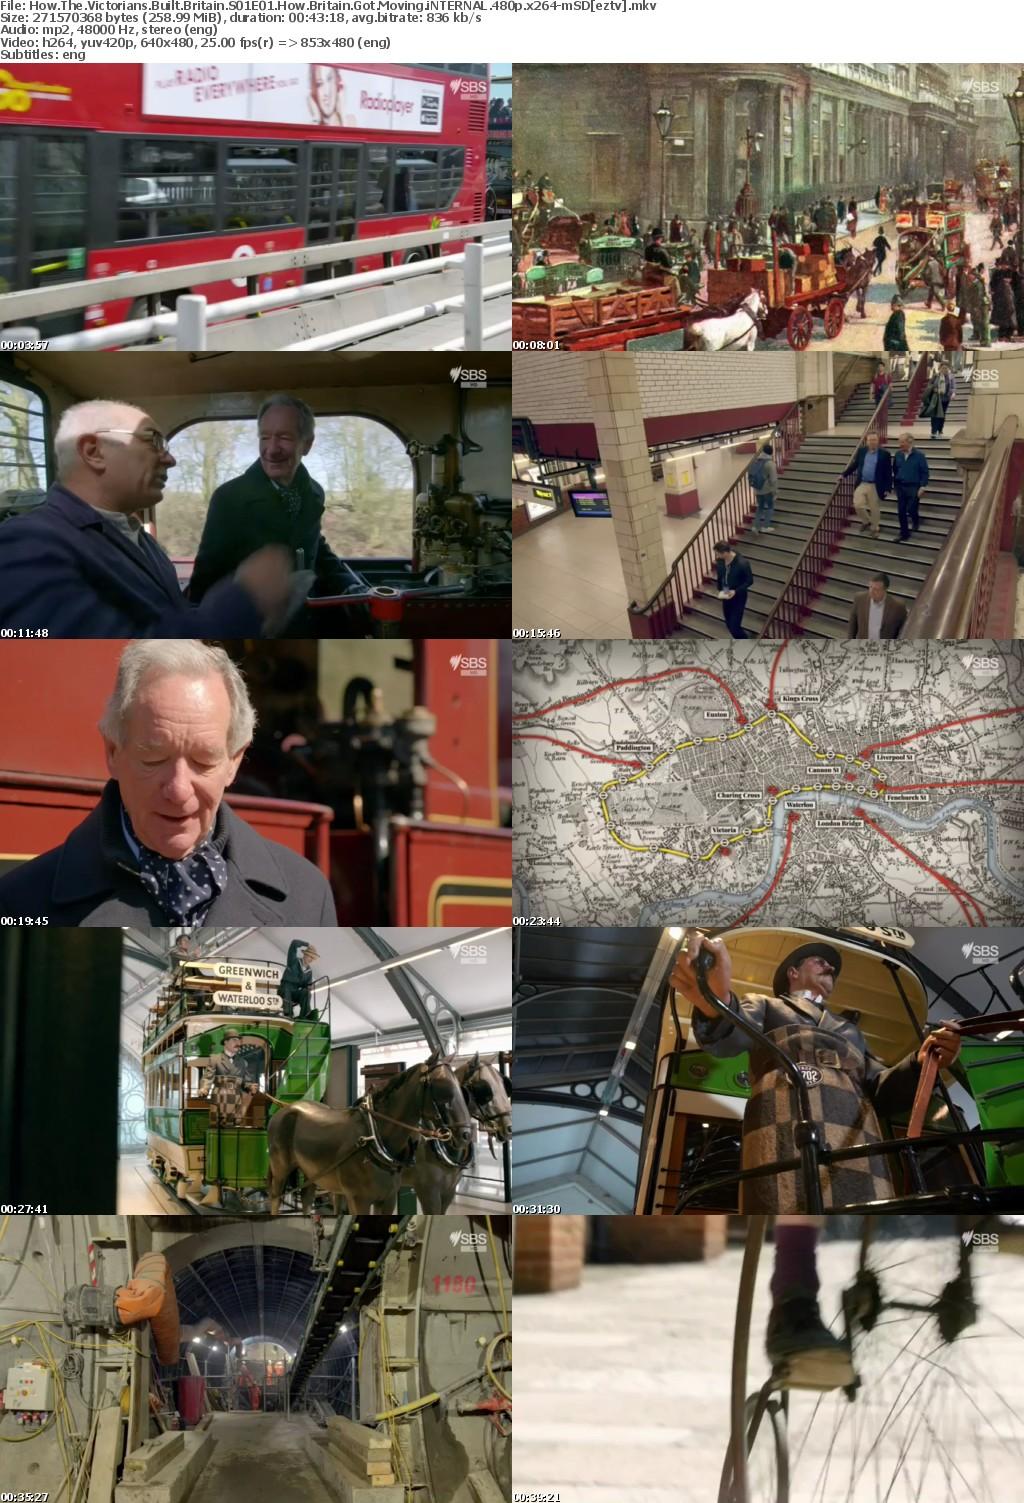 How The Victorians Built Britain S01E01 How Britain Got Moving iNTERNAL 480p x264-mSD